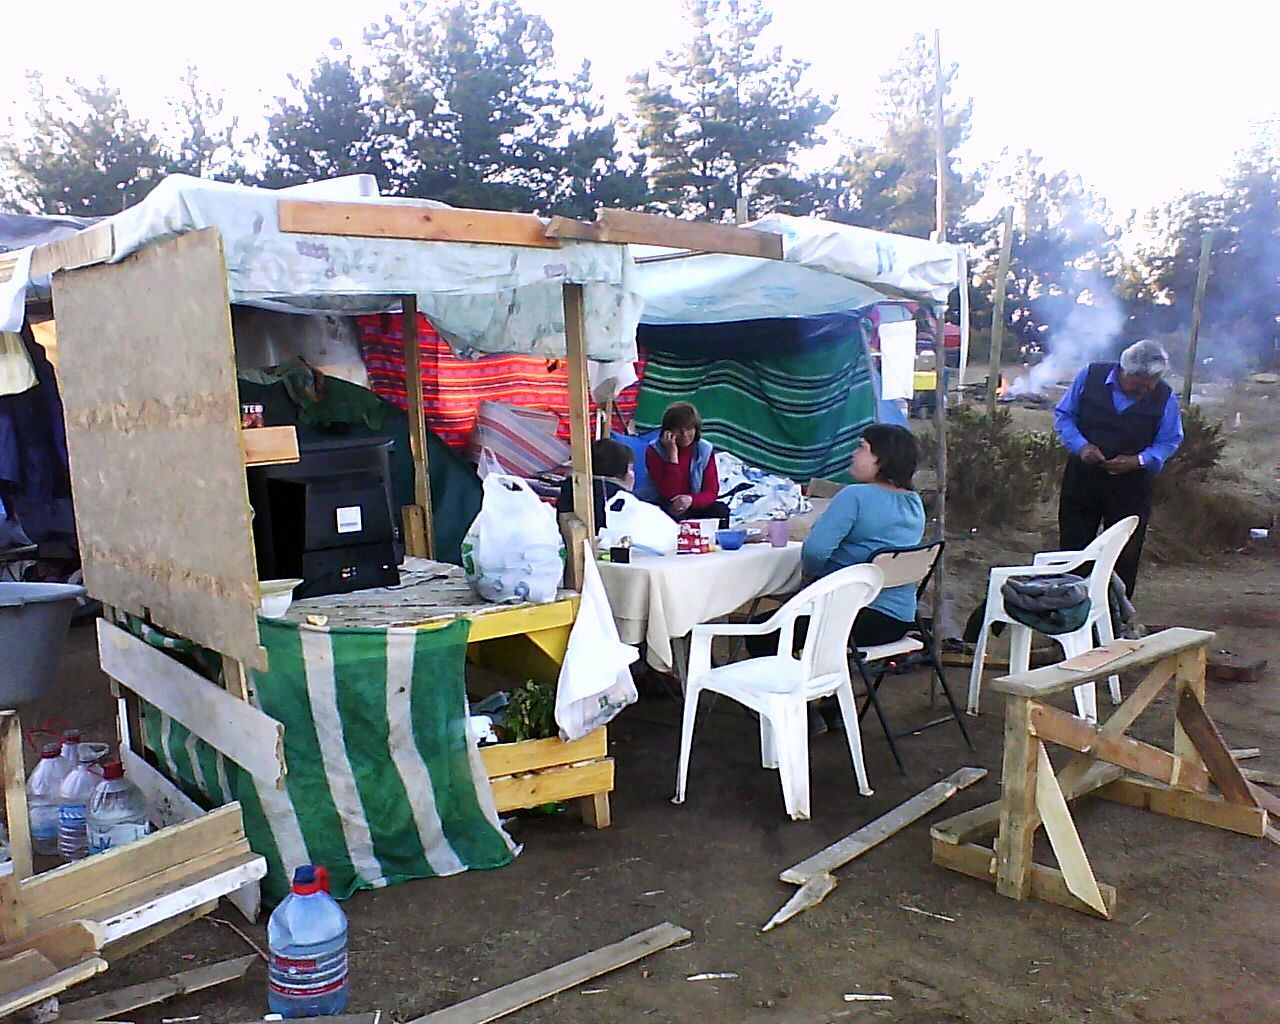 Camping Wikipedia The Free Encyclopedia